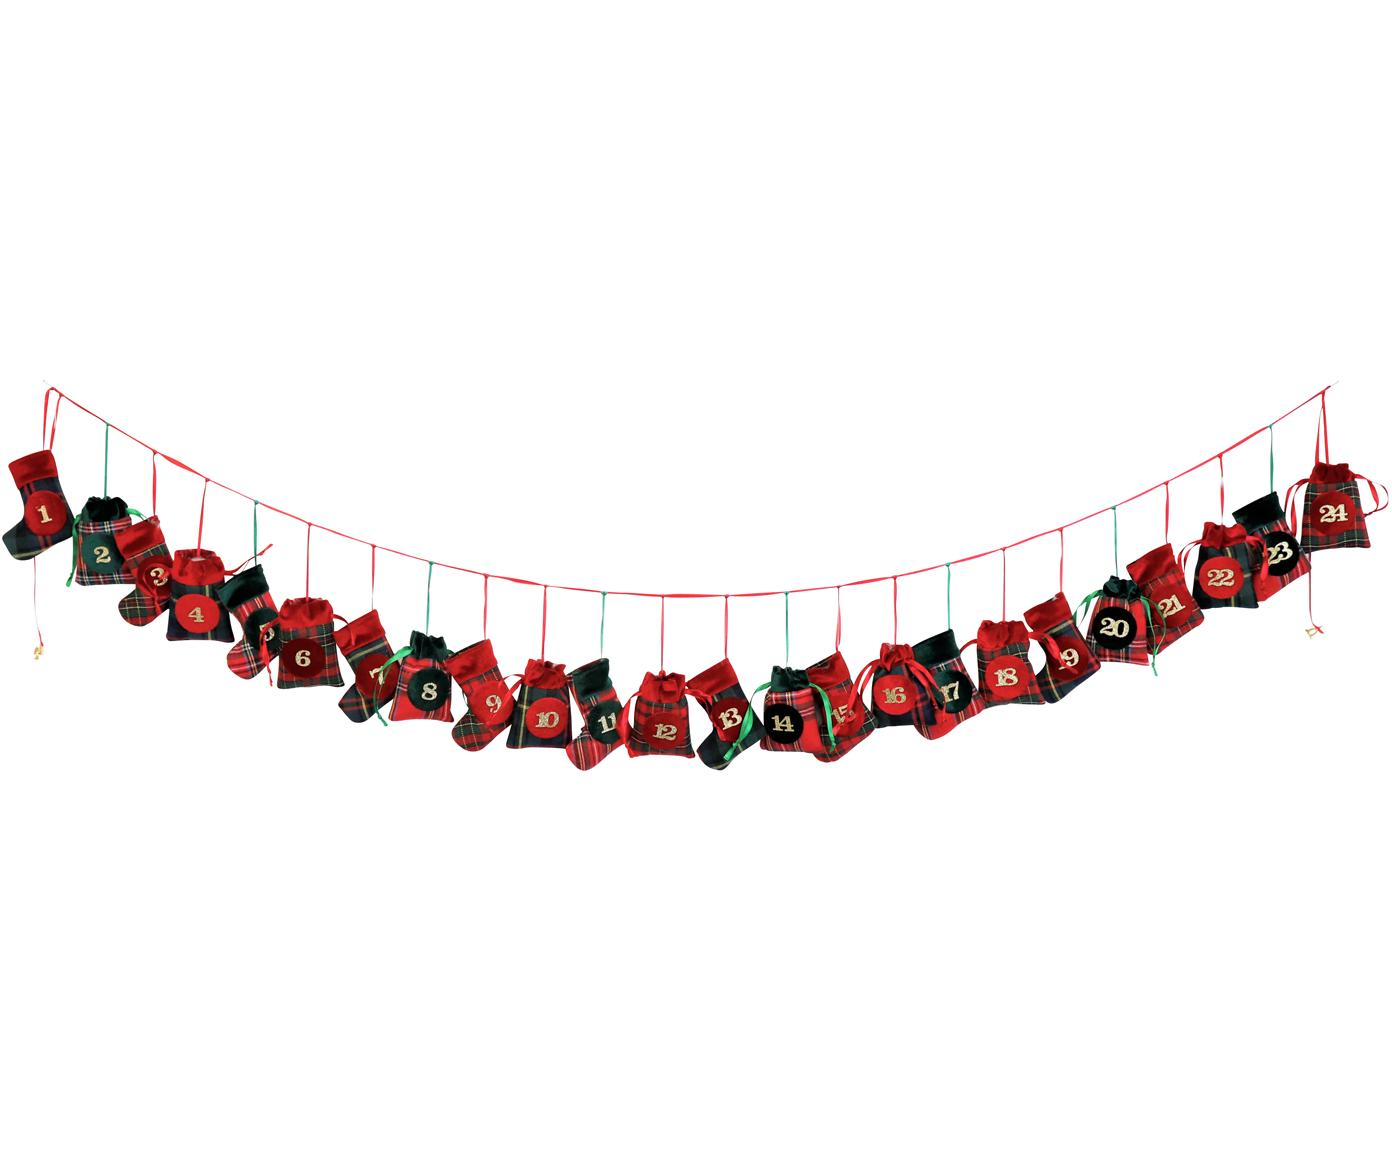 Calendario dell'avvento Merry X-Mas, Poliestere, cotone, Verde, rosso, nero, Lung. 270 cm